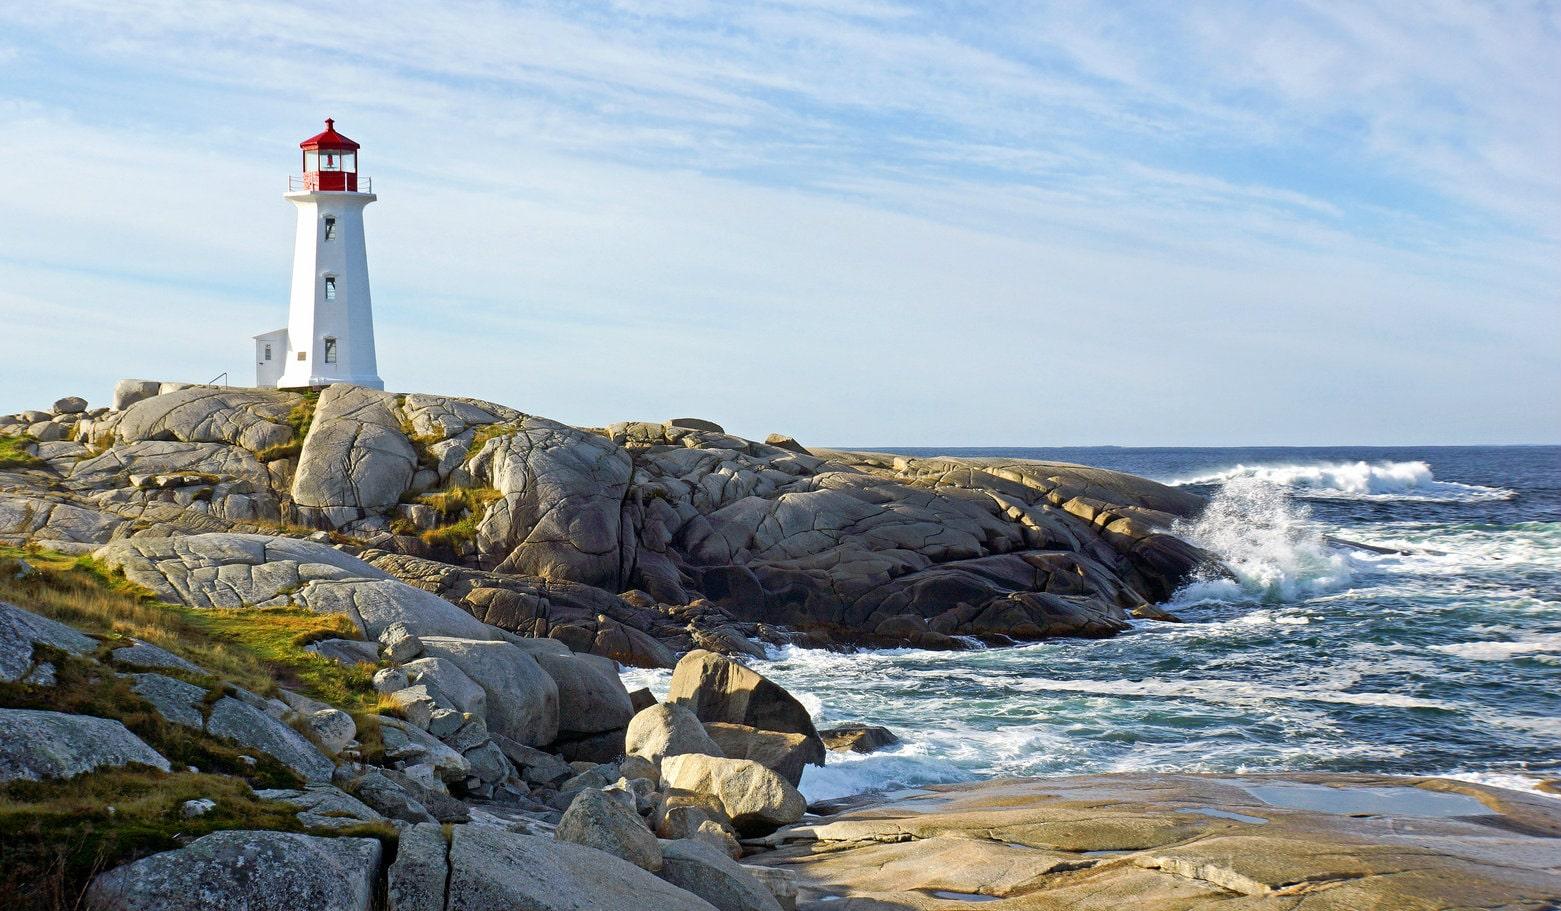 lighthouse-at-kovalam-beach-secret-world